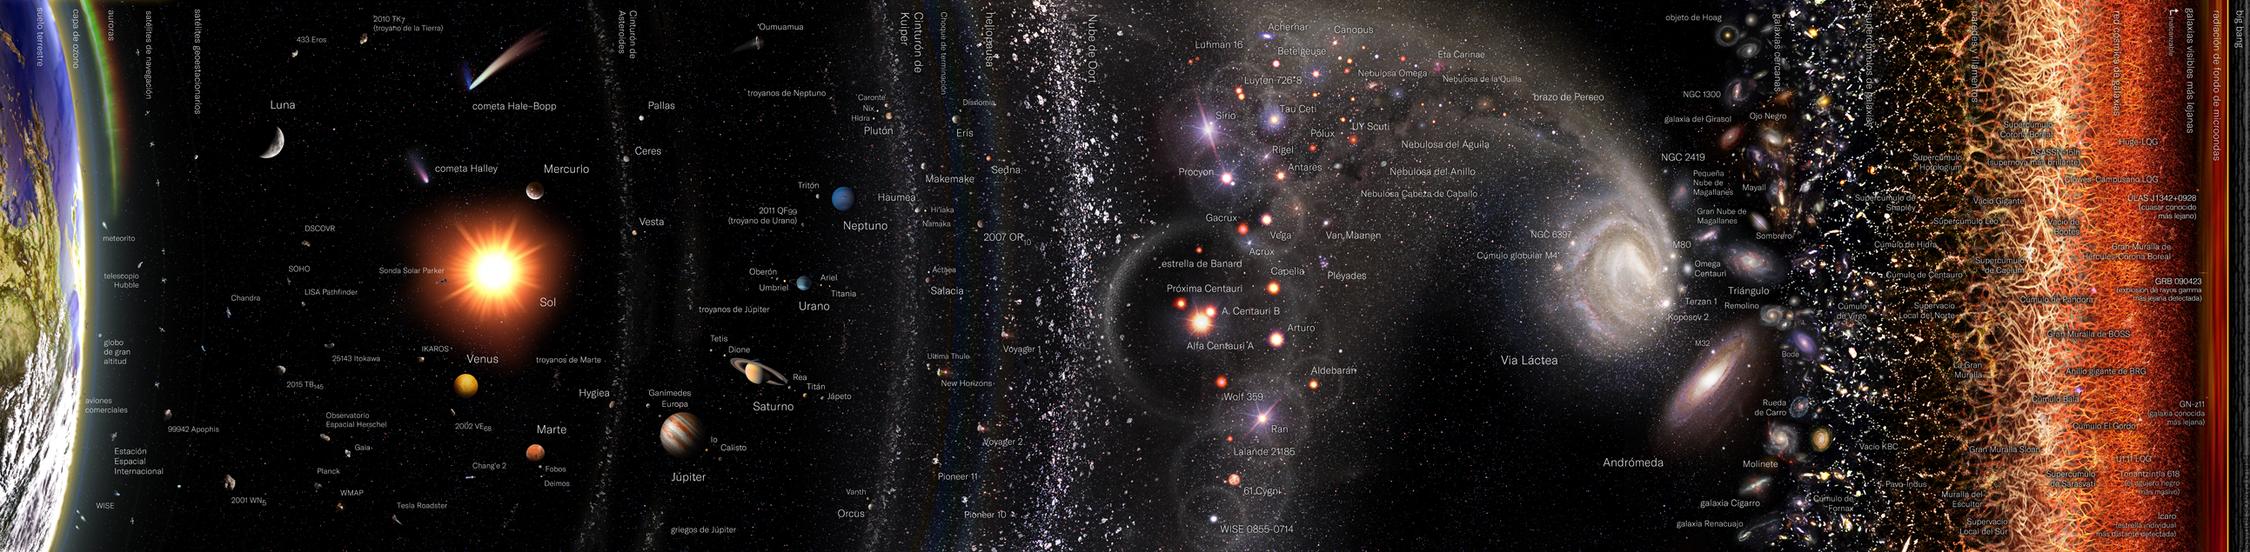 Universo observable - Wikipedia, la enciclopedia libre